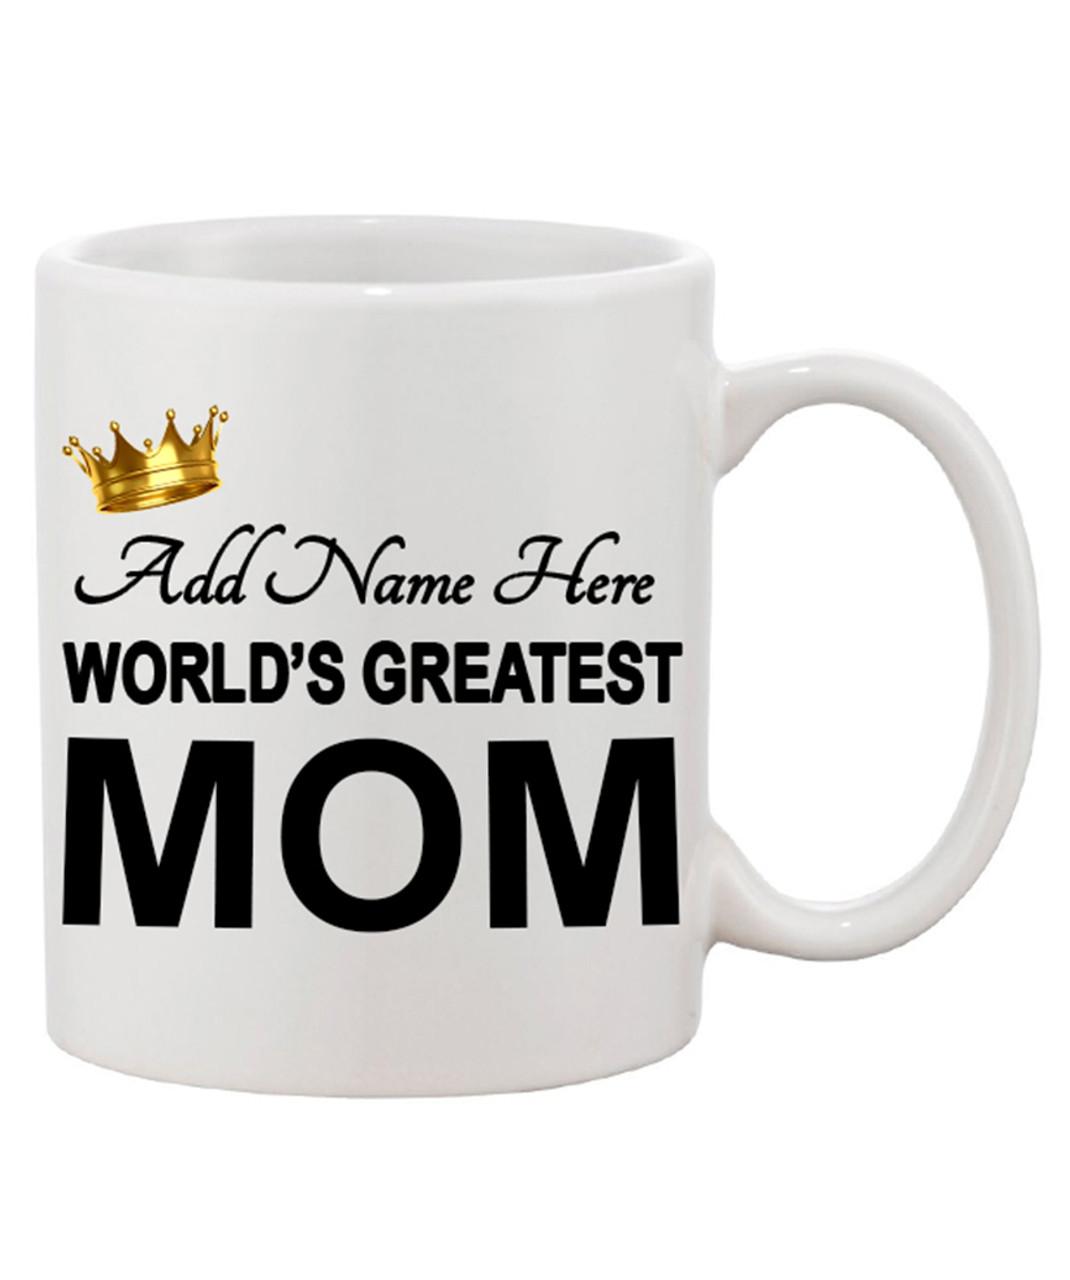 7b4a368db00 Custom Personalized World's Greatest MOM Ceramic Coffee Mug ...